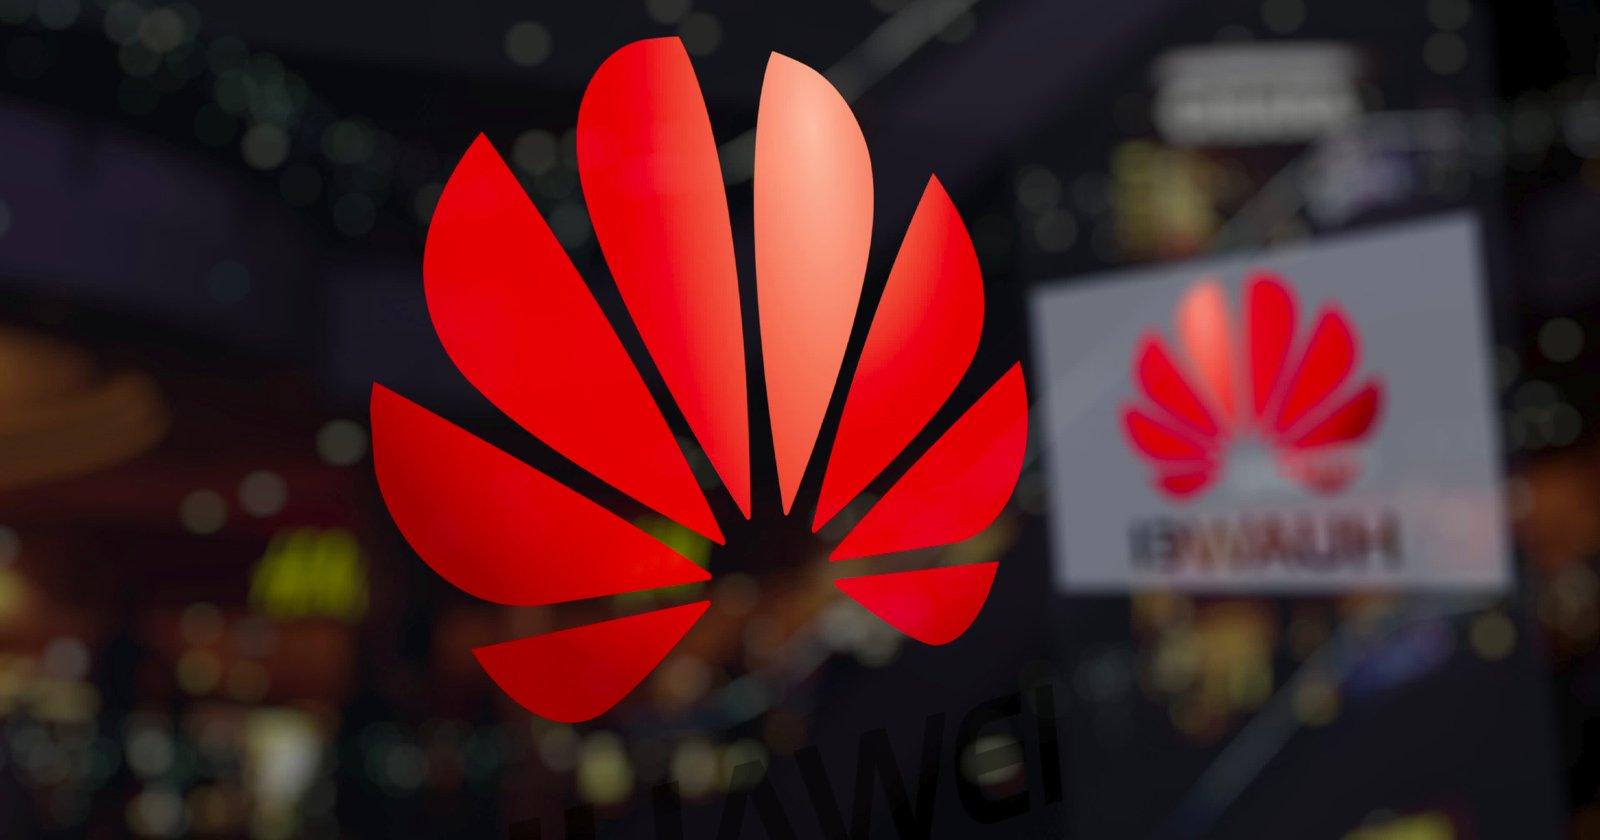 U.S. Trade Bans Hurting Huawei in China, Brand's Future Looks Bleak